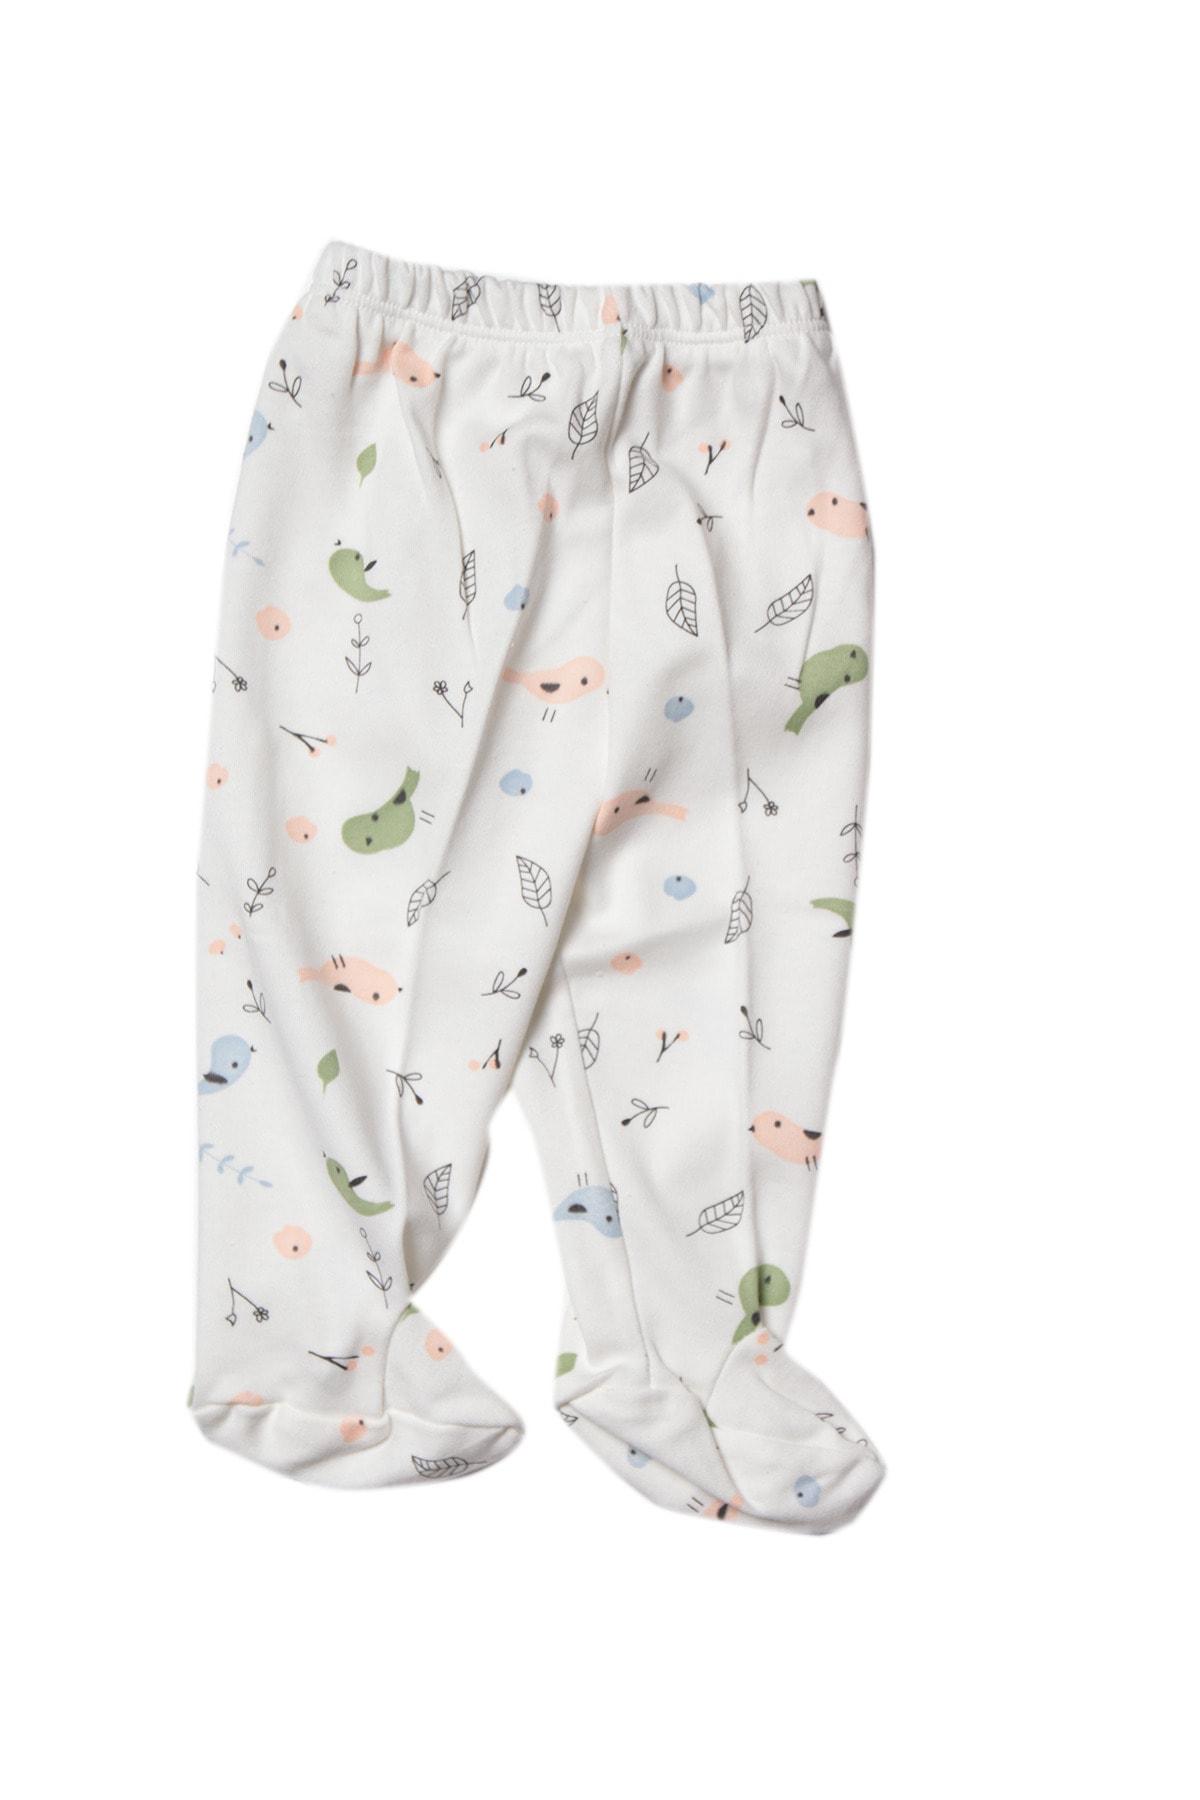 MUDİ BABY Unisex Bebek %100 Pamuk Pijama Altı 1